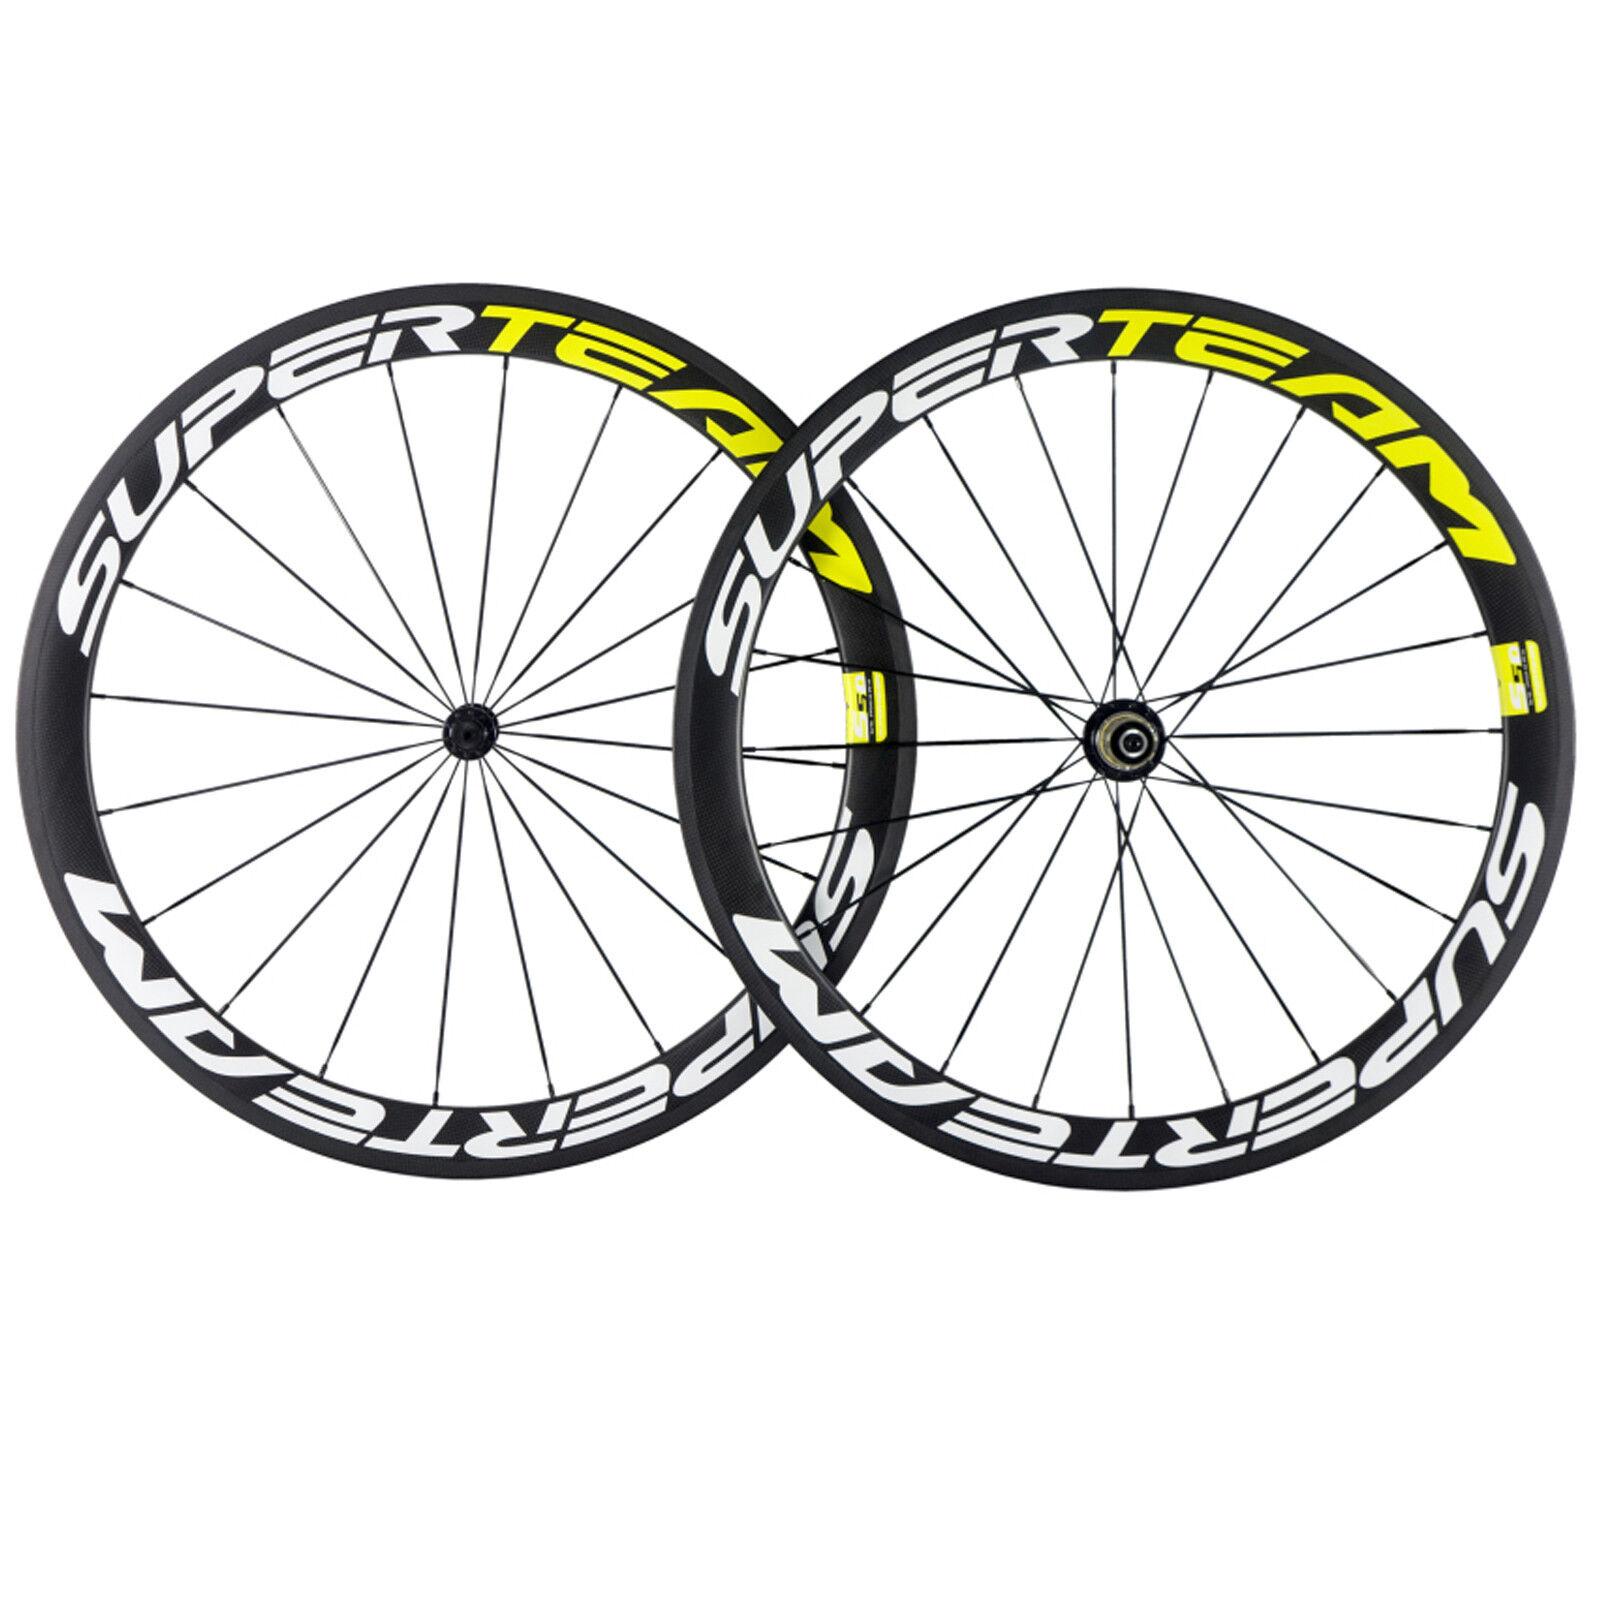 Superteam Carbon Wheels R13 Hub Yellow 50mm Depth Road Bike Bicycle Wheels F R